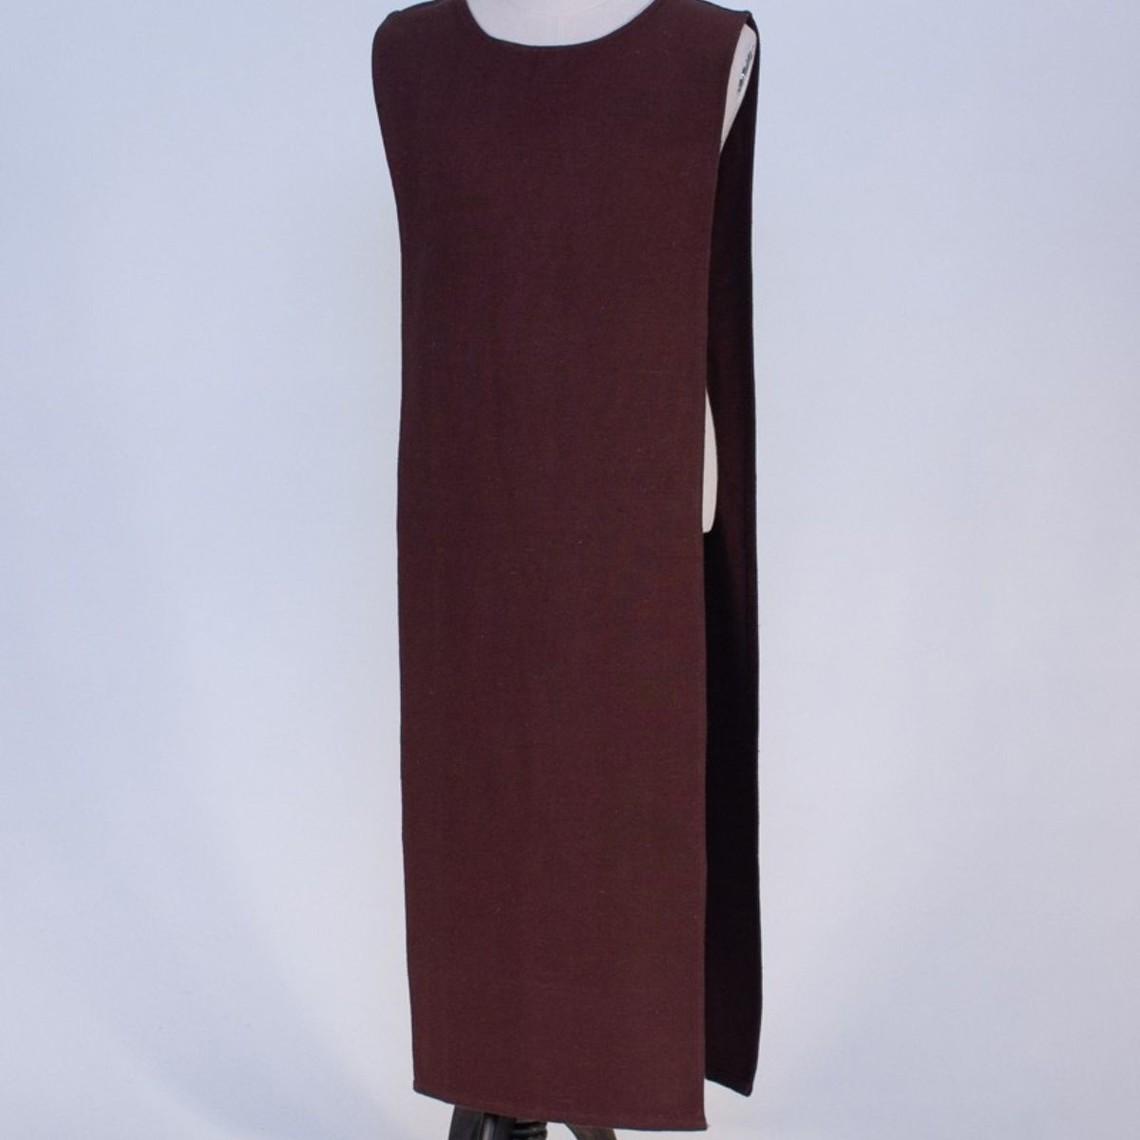 Burgschneider Tabard / manteau médiéval, marron